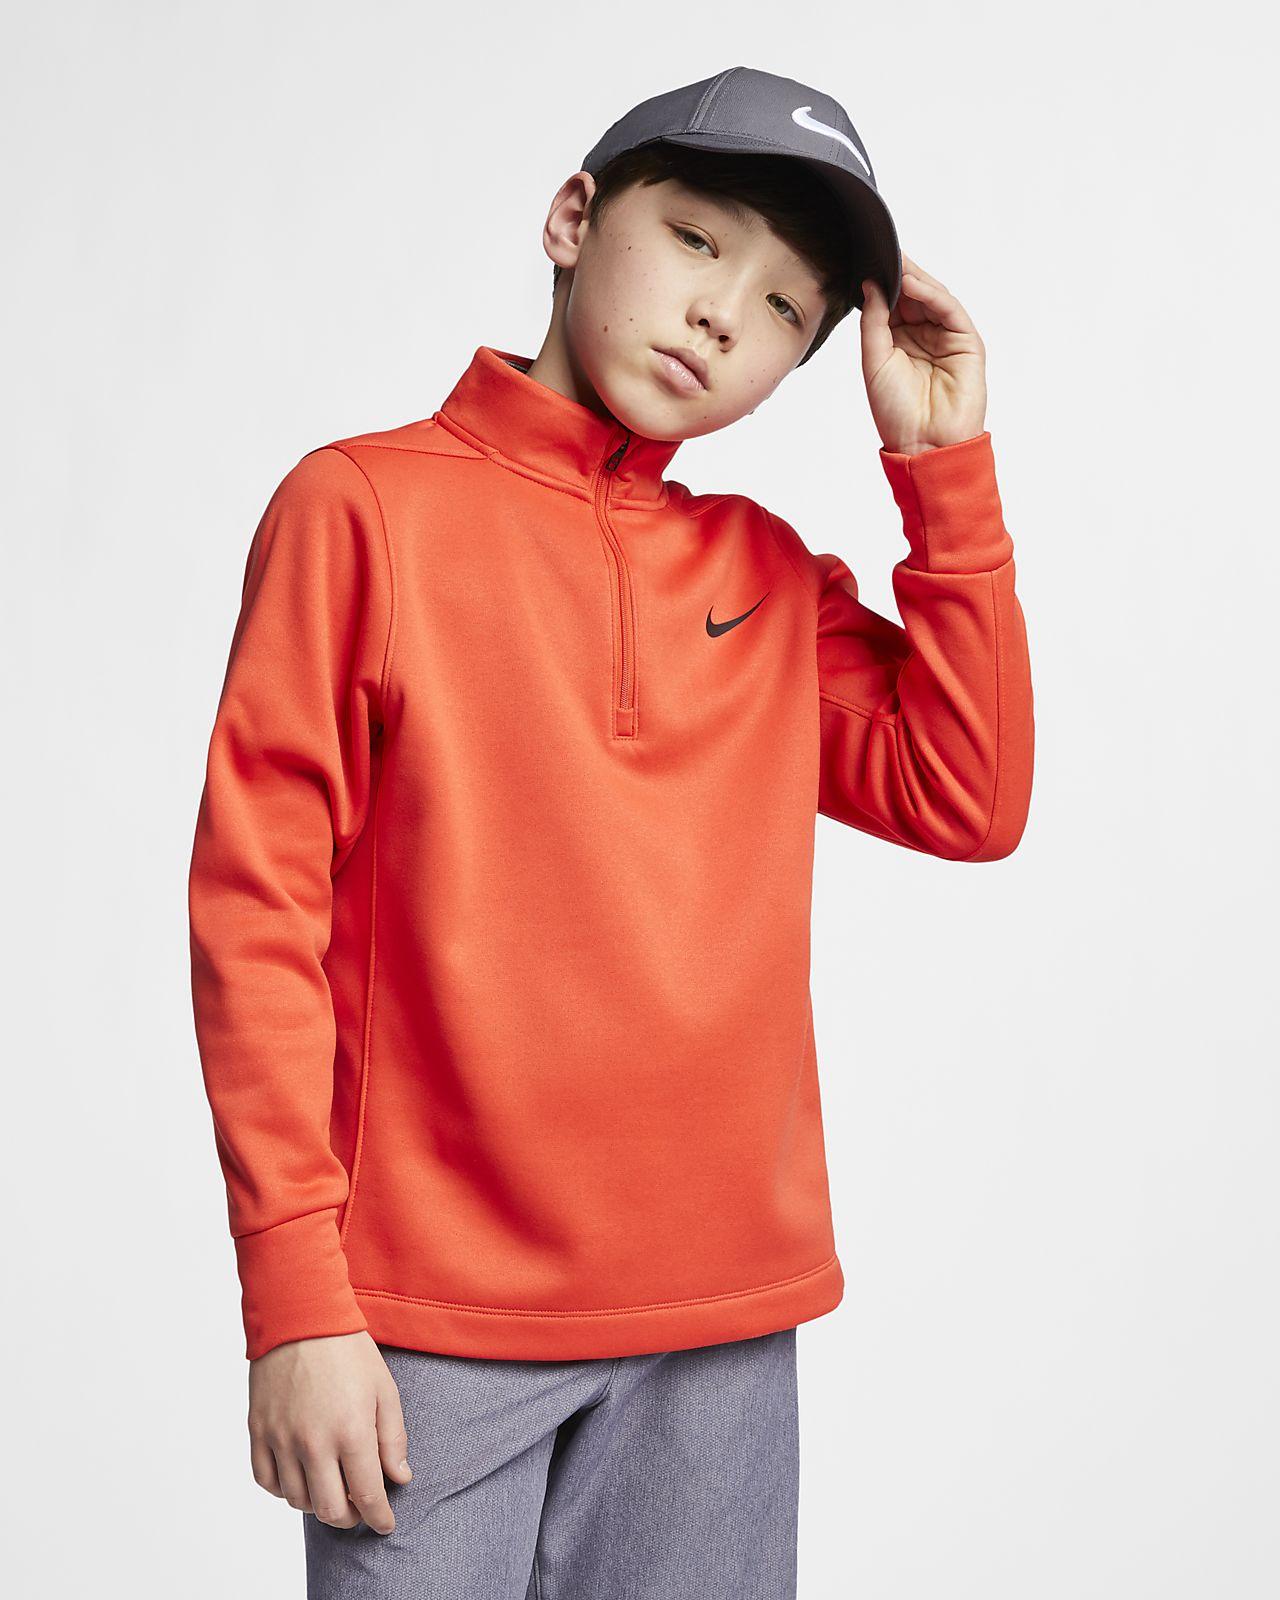 Nike Dri-FIT Therma Samarreta de golf amb mitja cremallera - Nen